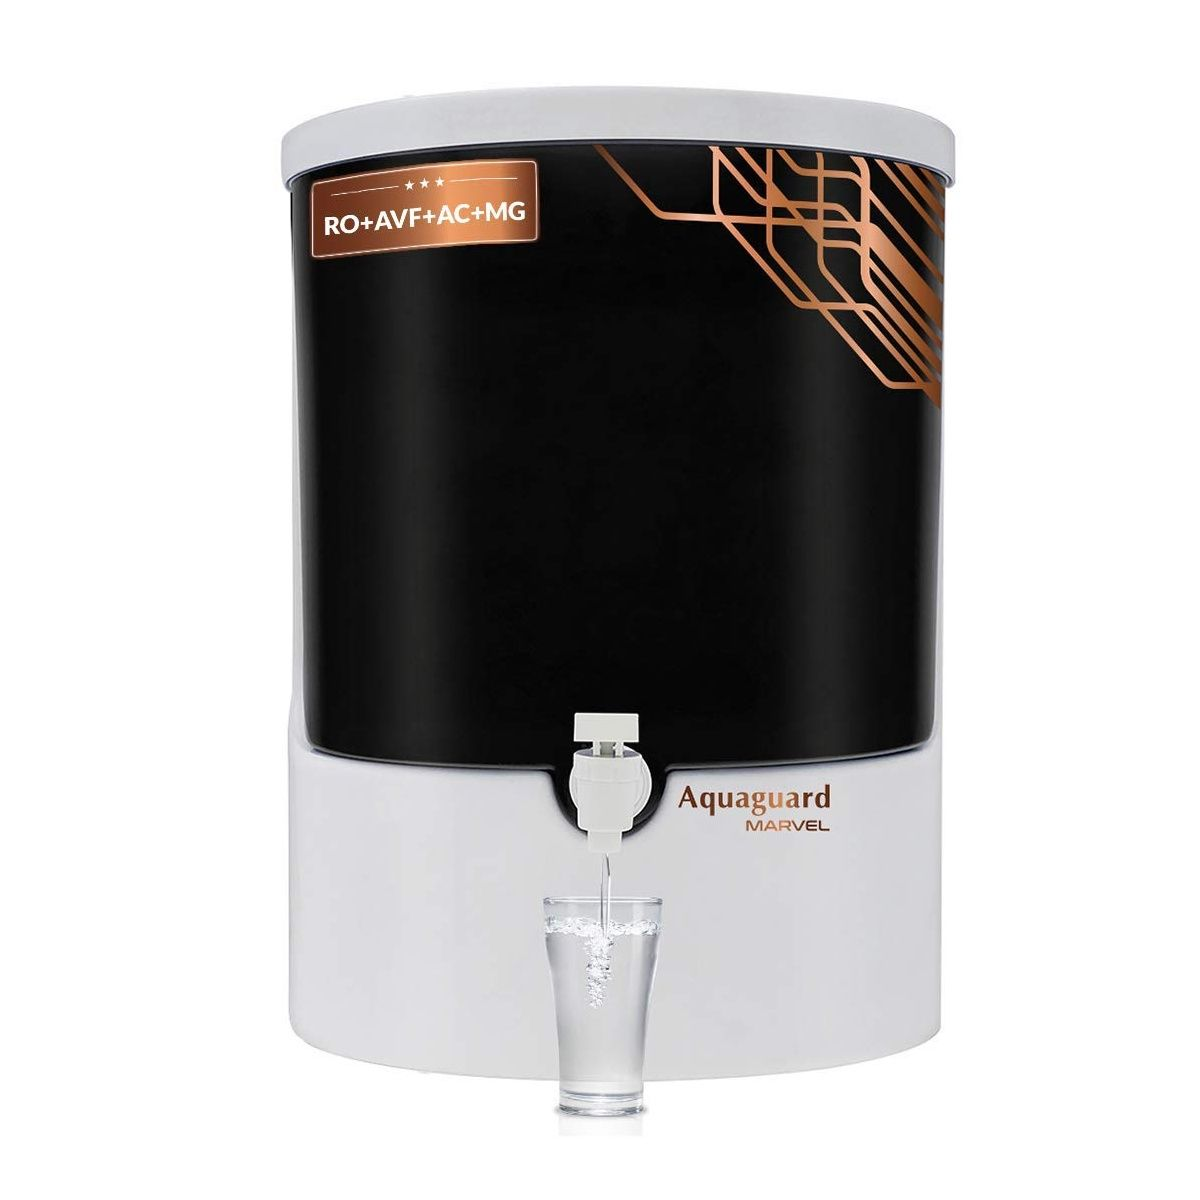 Aquaguard Marvel Water Purifier